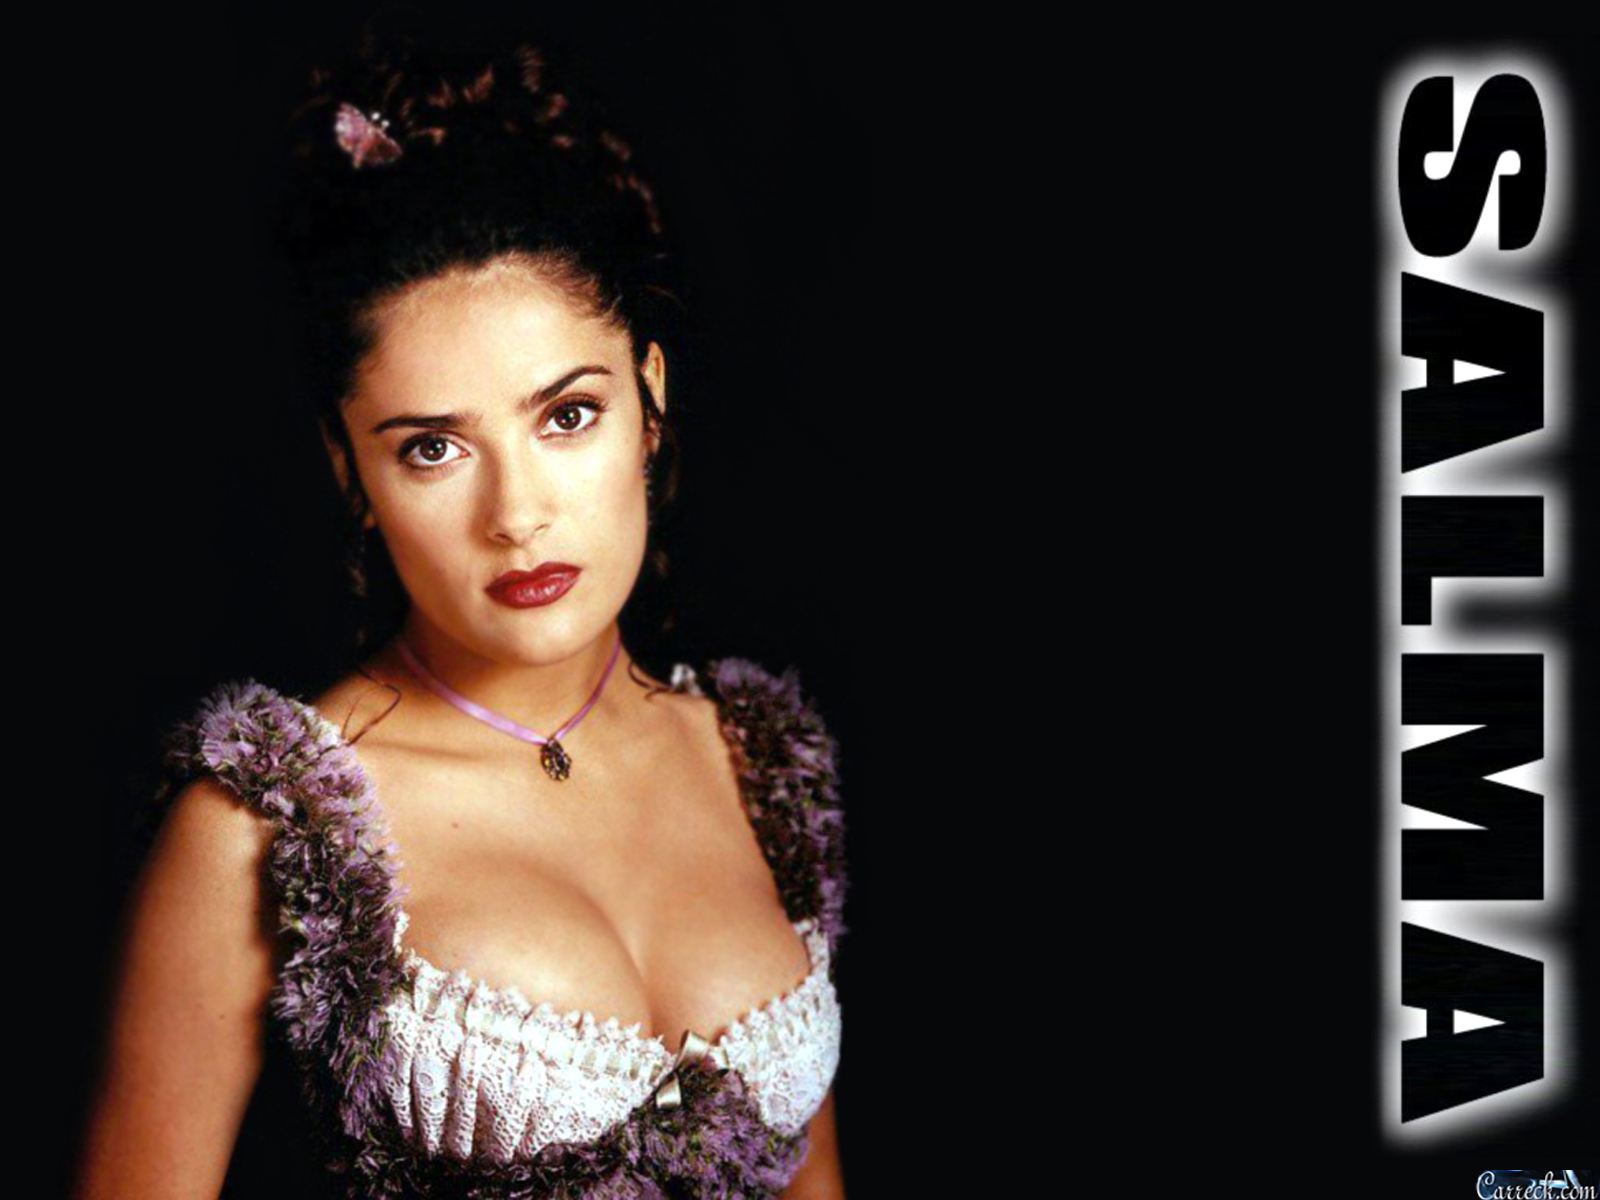 http://2.bp.blogspot.com/-k1U7x_F3eow/T_HEubeVFaI/AAAAAAAABIc/QqgU-MnAlx0/s1600/salma+hayek+wallpaper+005.jpg